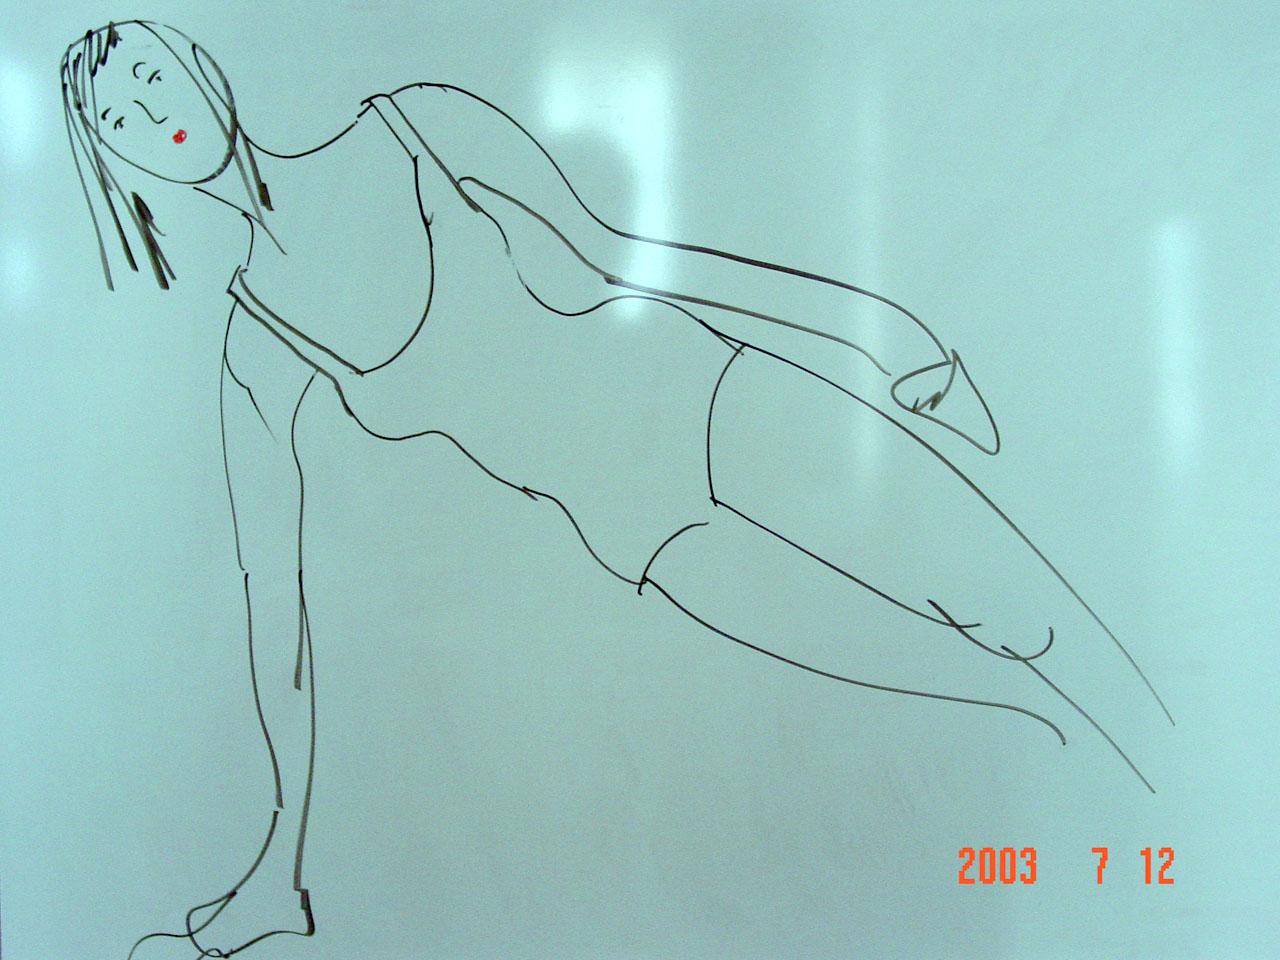 dessin_rolle_2003